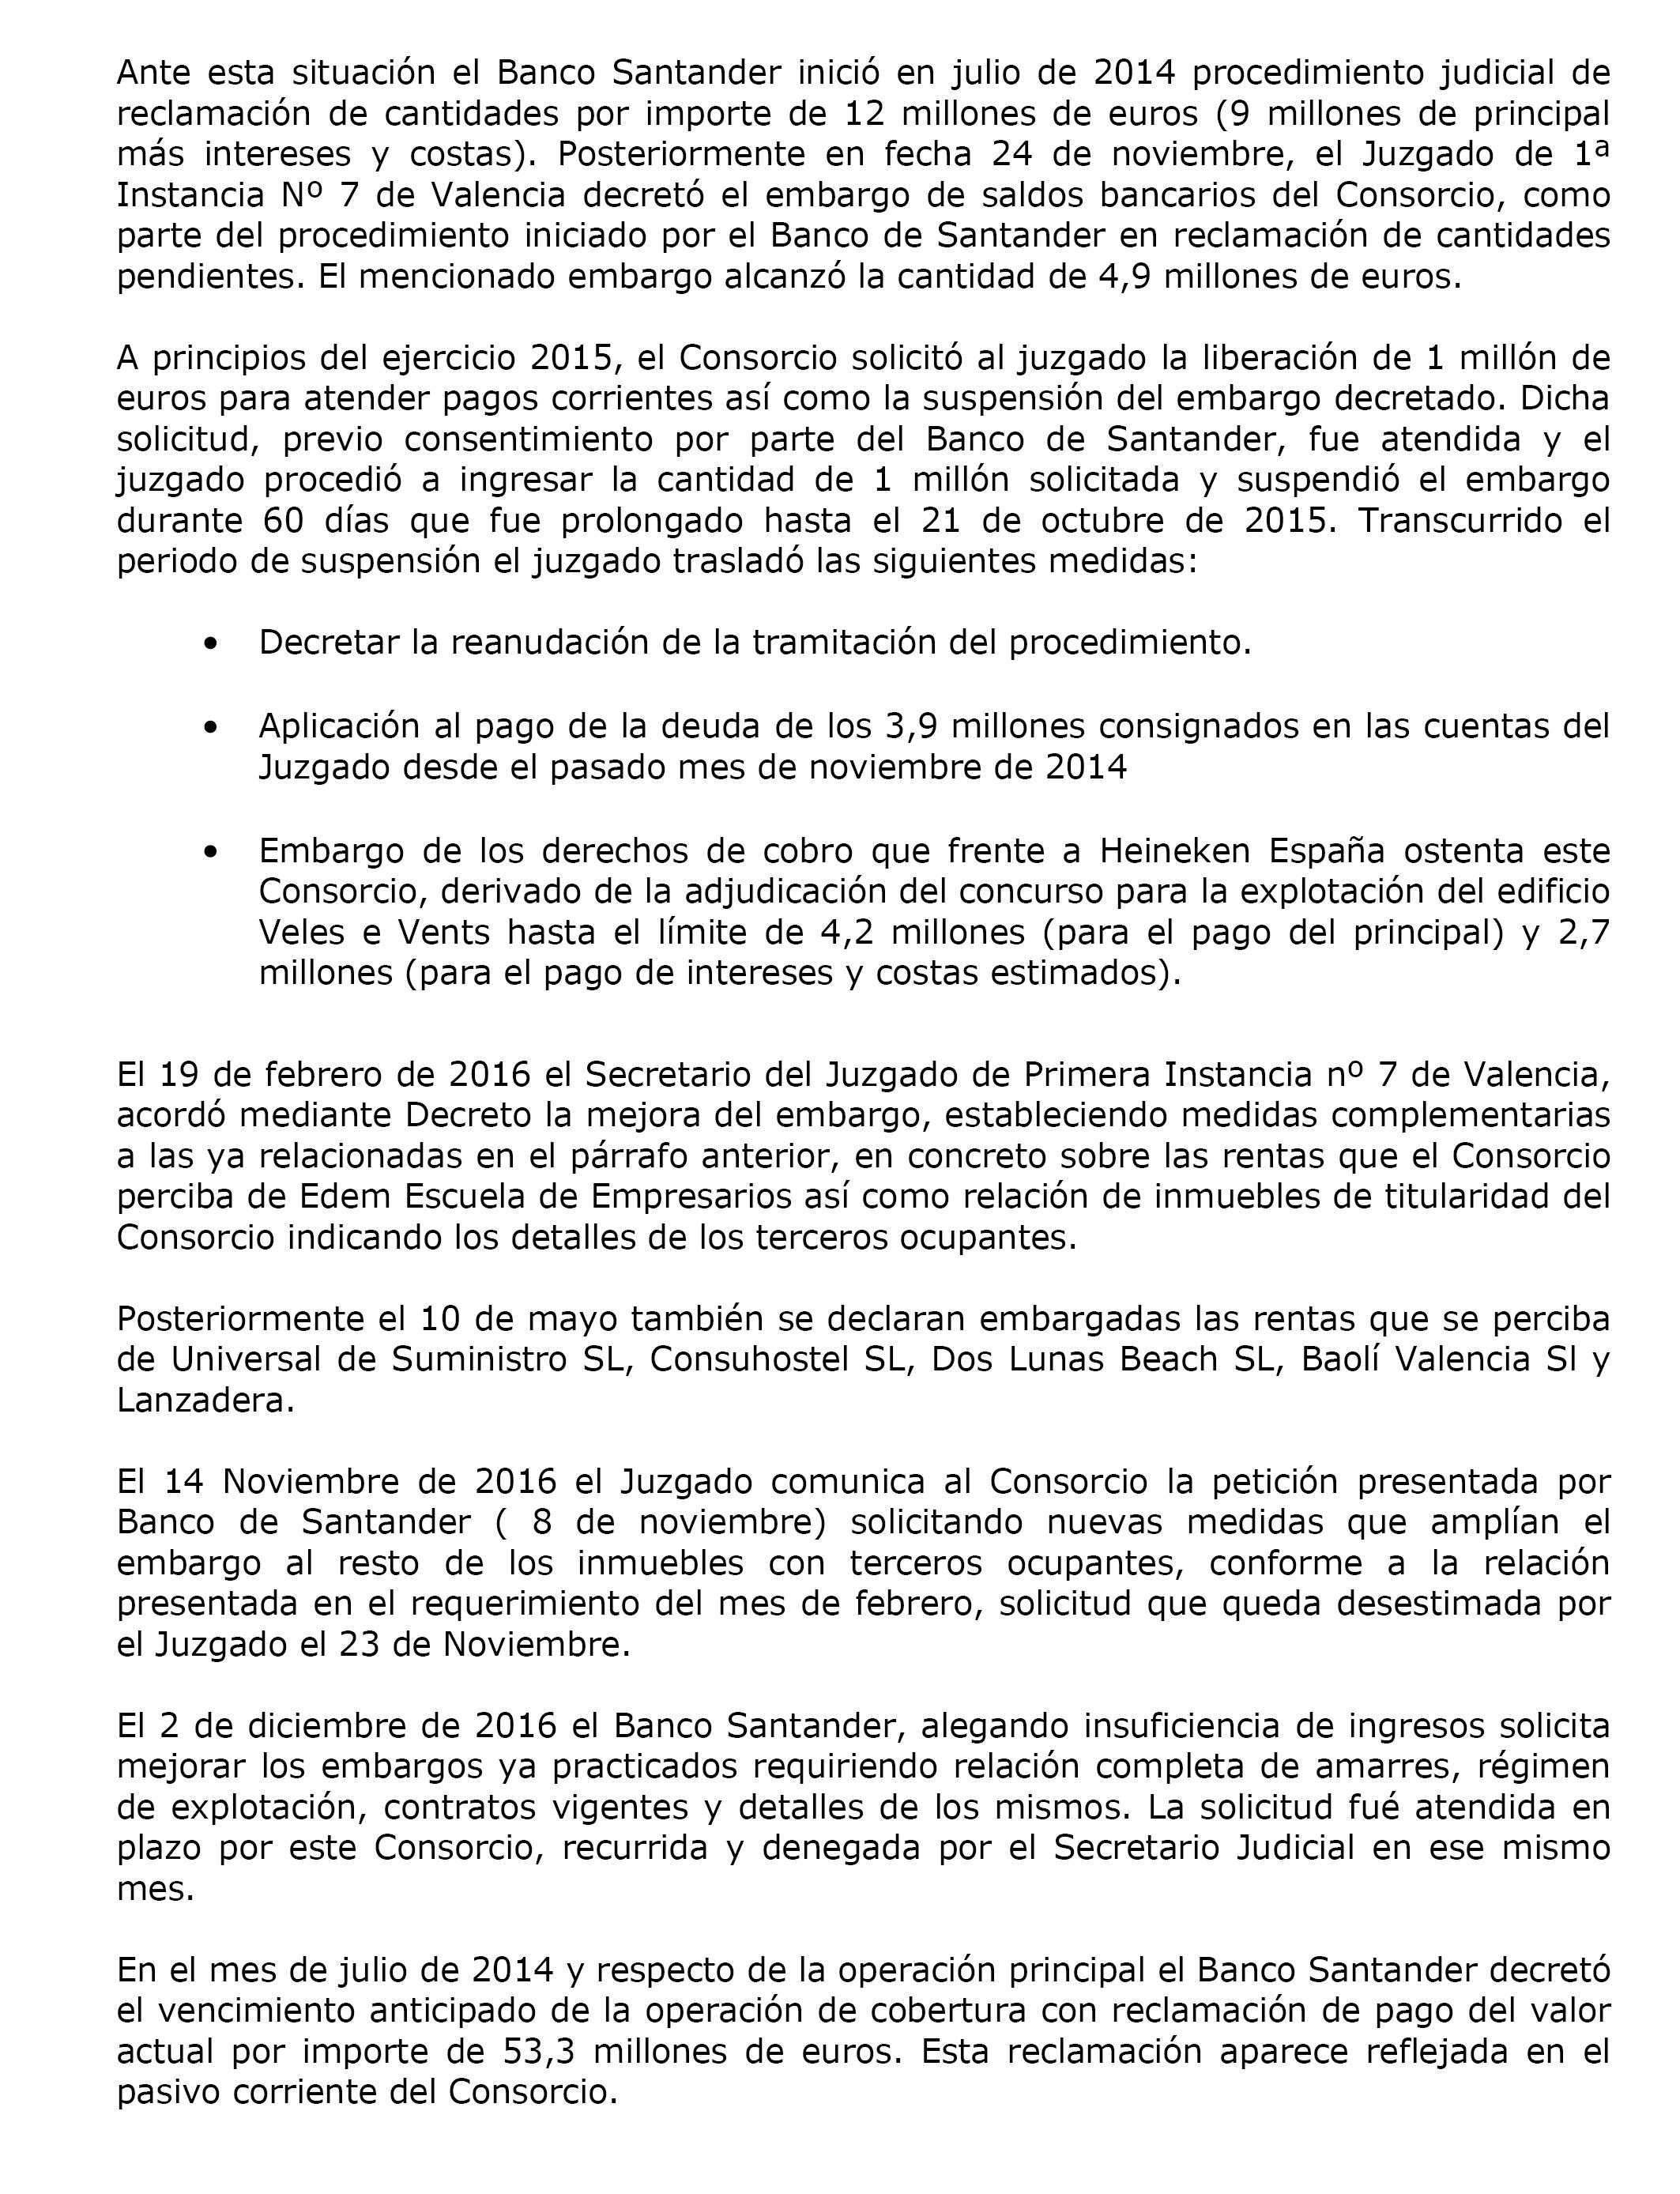 BOE.es - Documento BOE-A-2017-8815